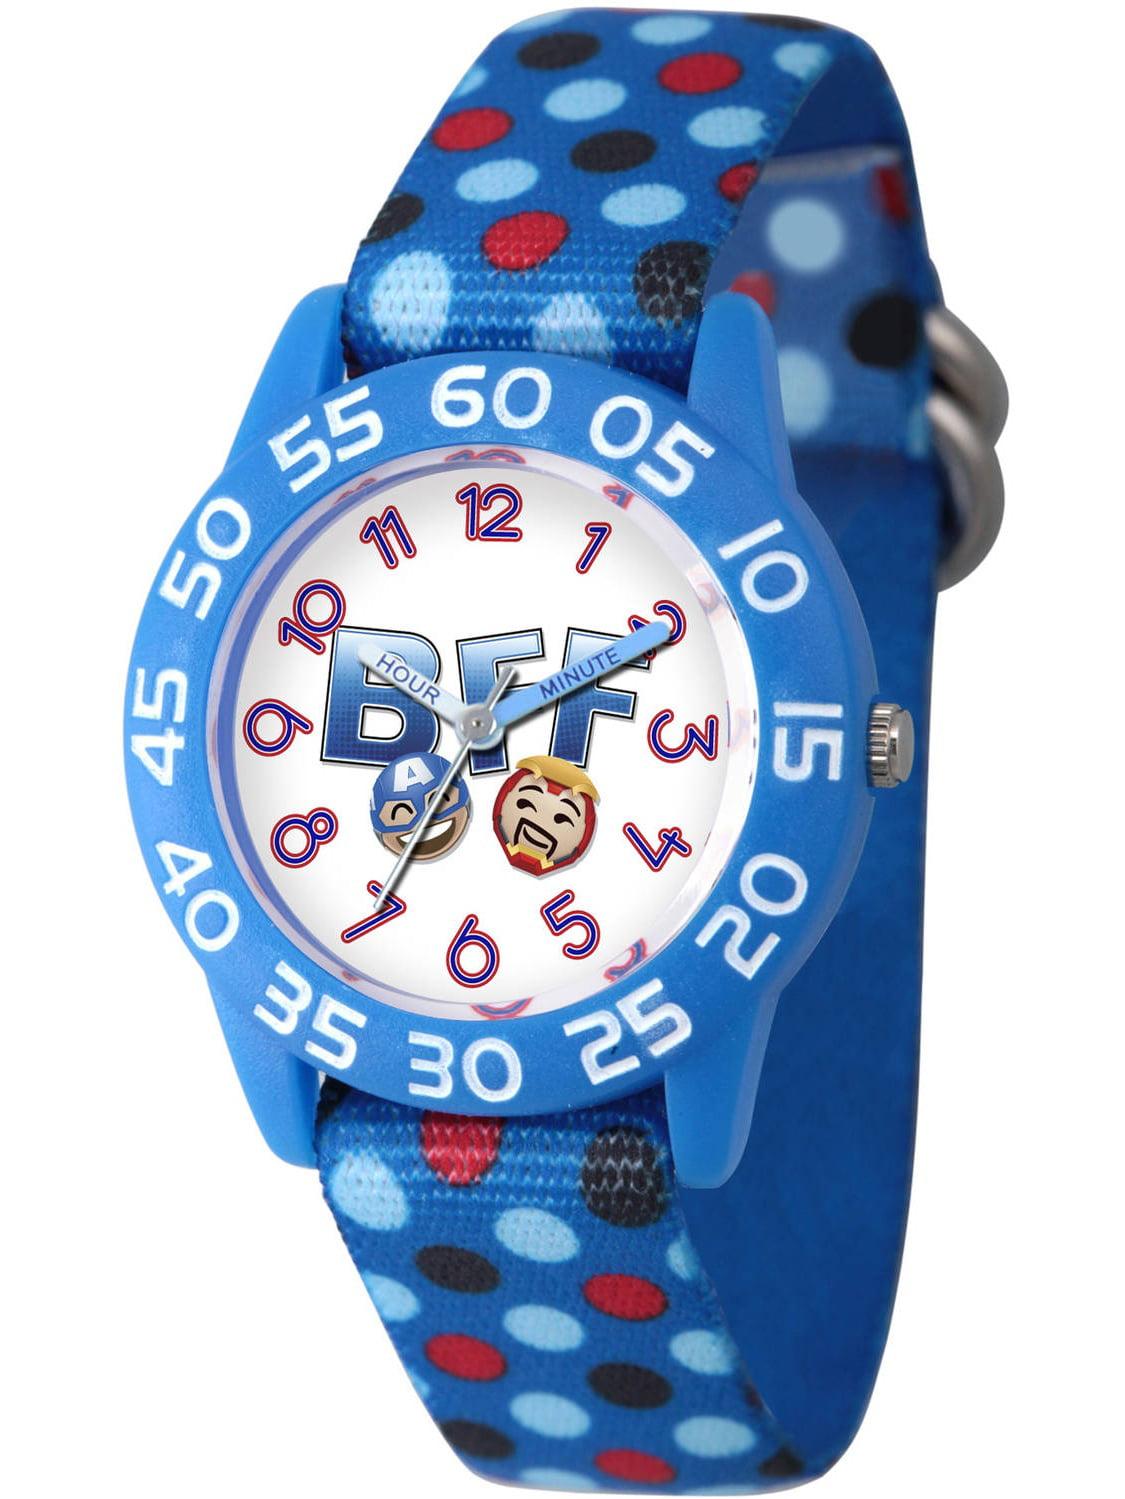 Emoji Kids' Iron Man and Captain America Blue Plastic Time Teacher Watch, Blue Nylon Strap with Polka Dot Printing